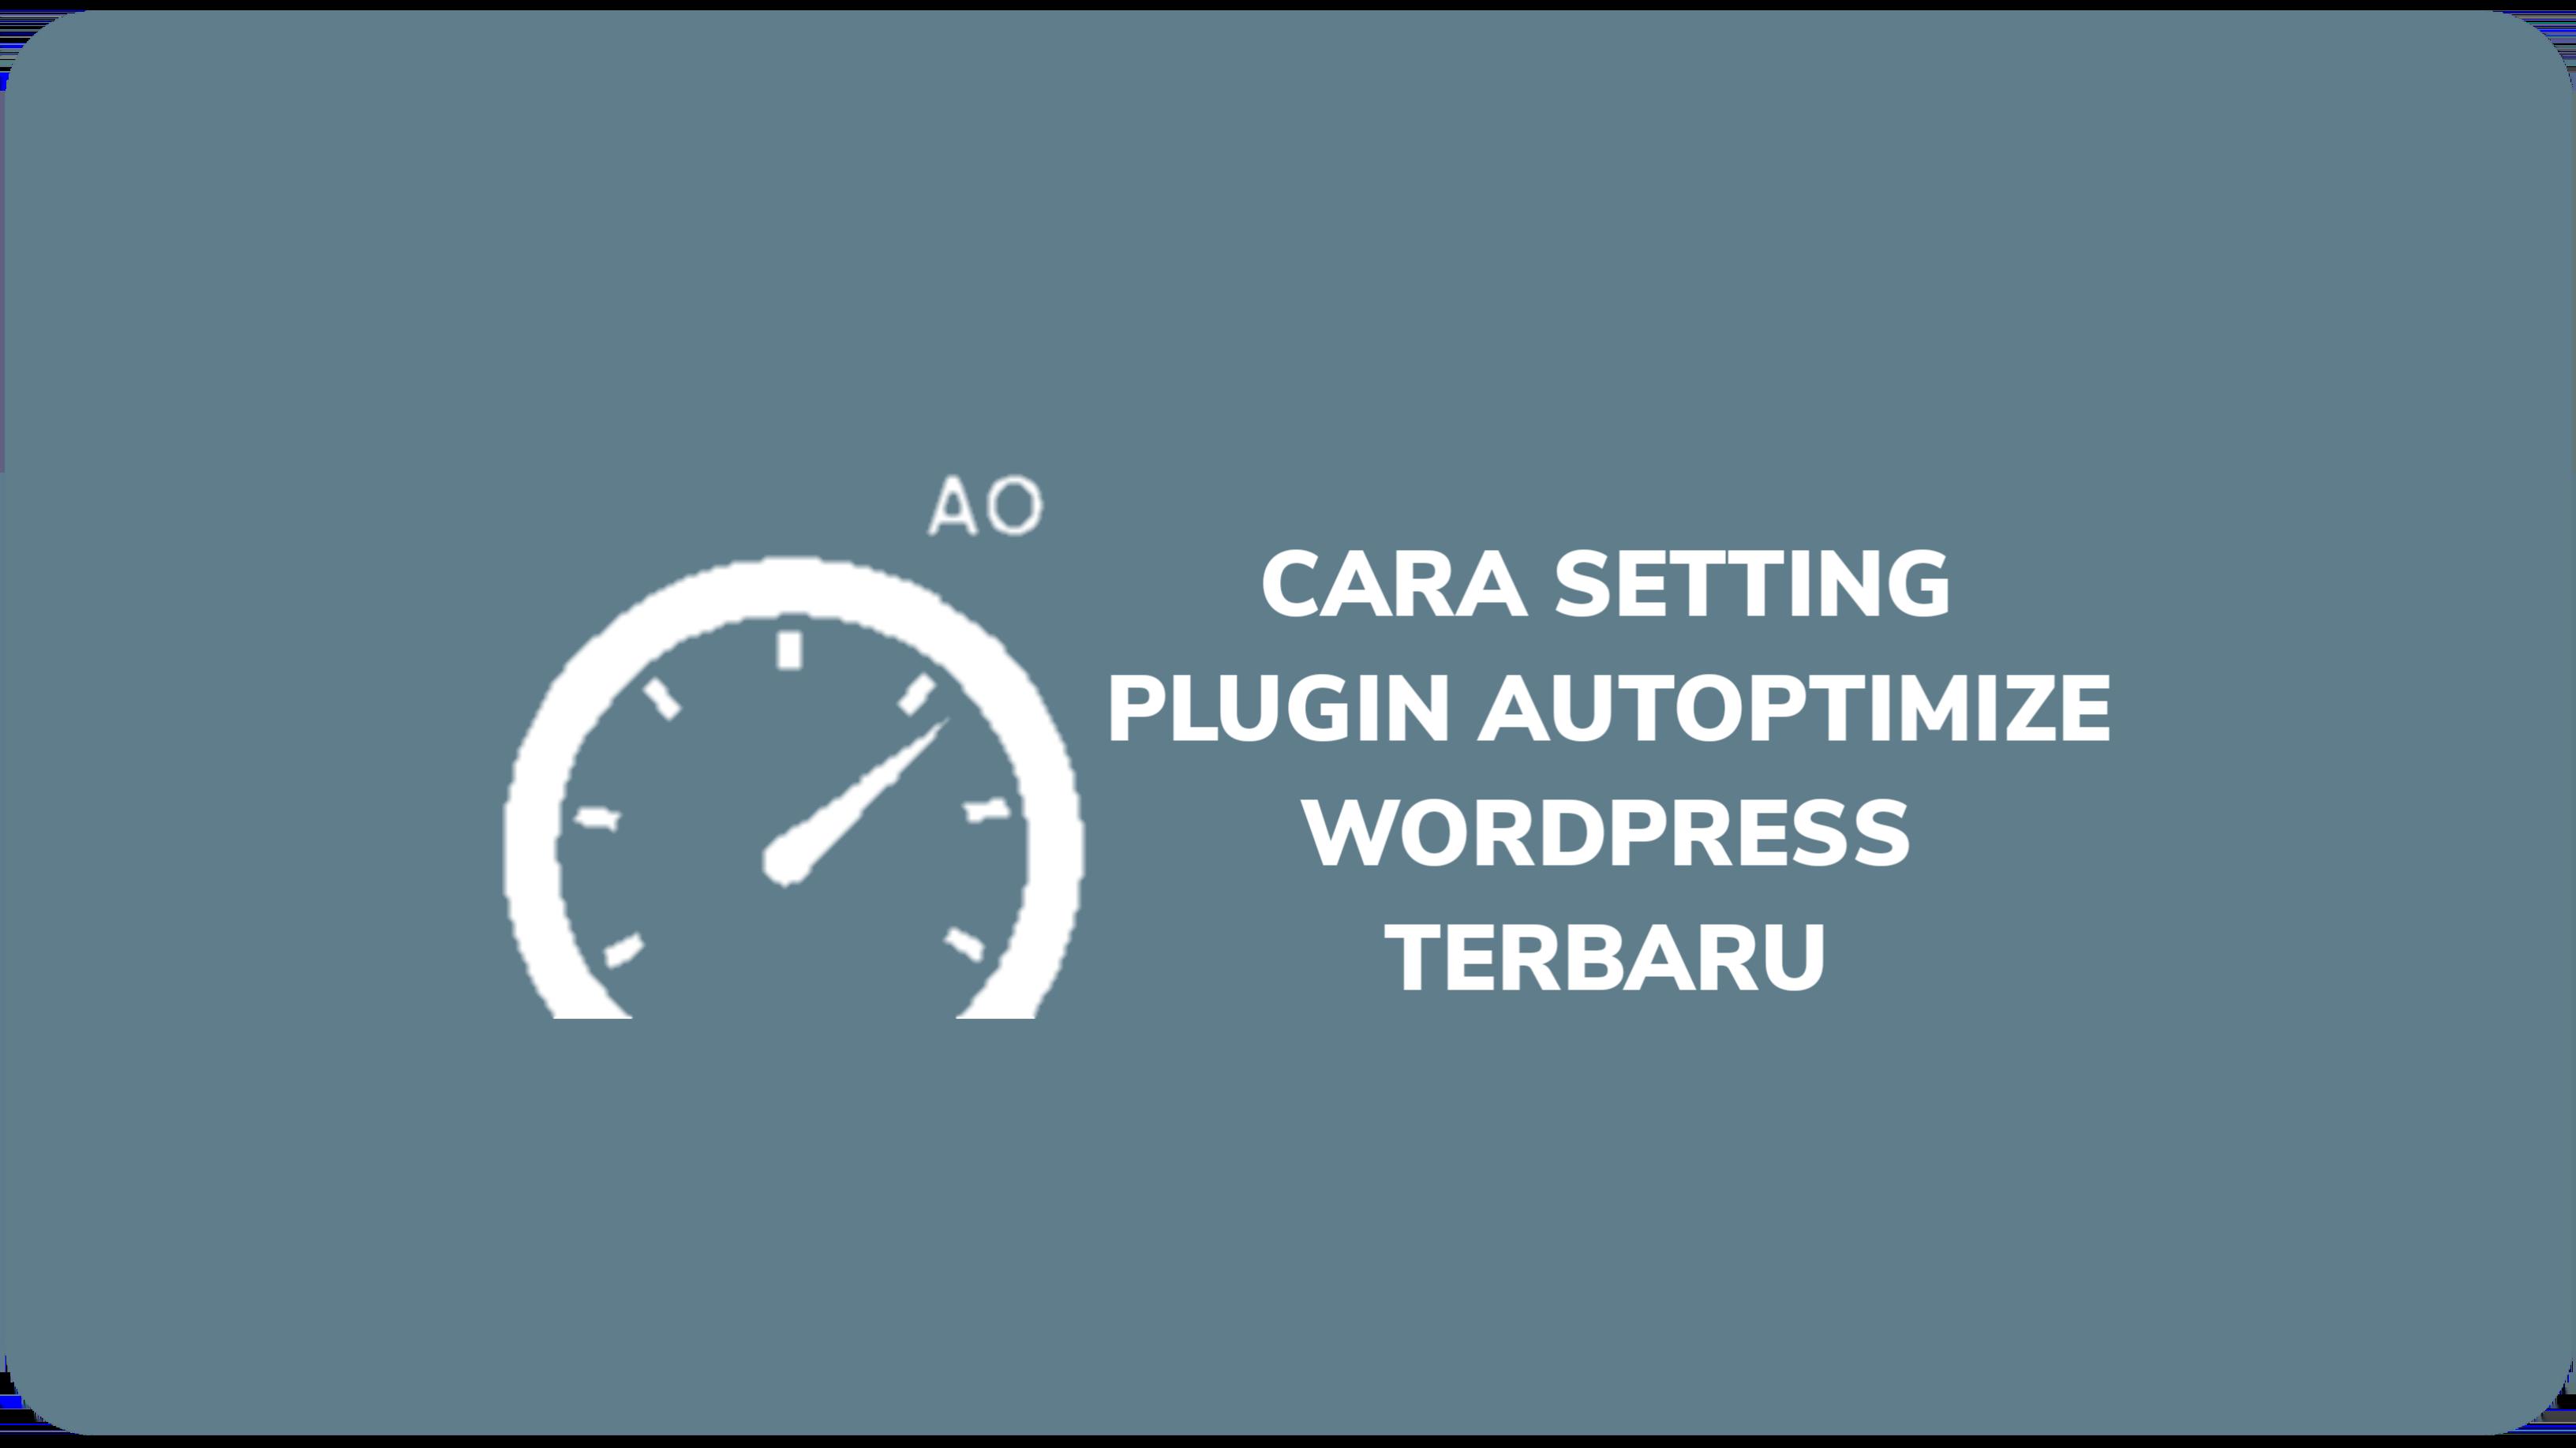 Cara Setting Plugin Autoptimize Wordpress Terbaru